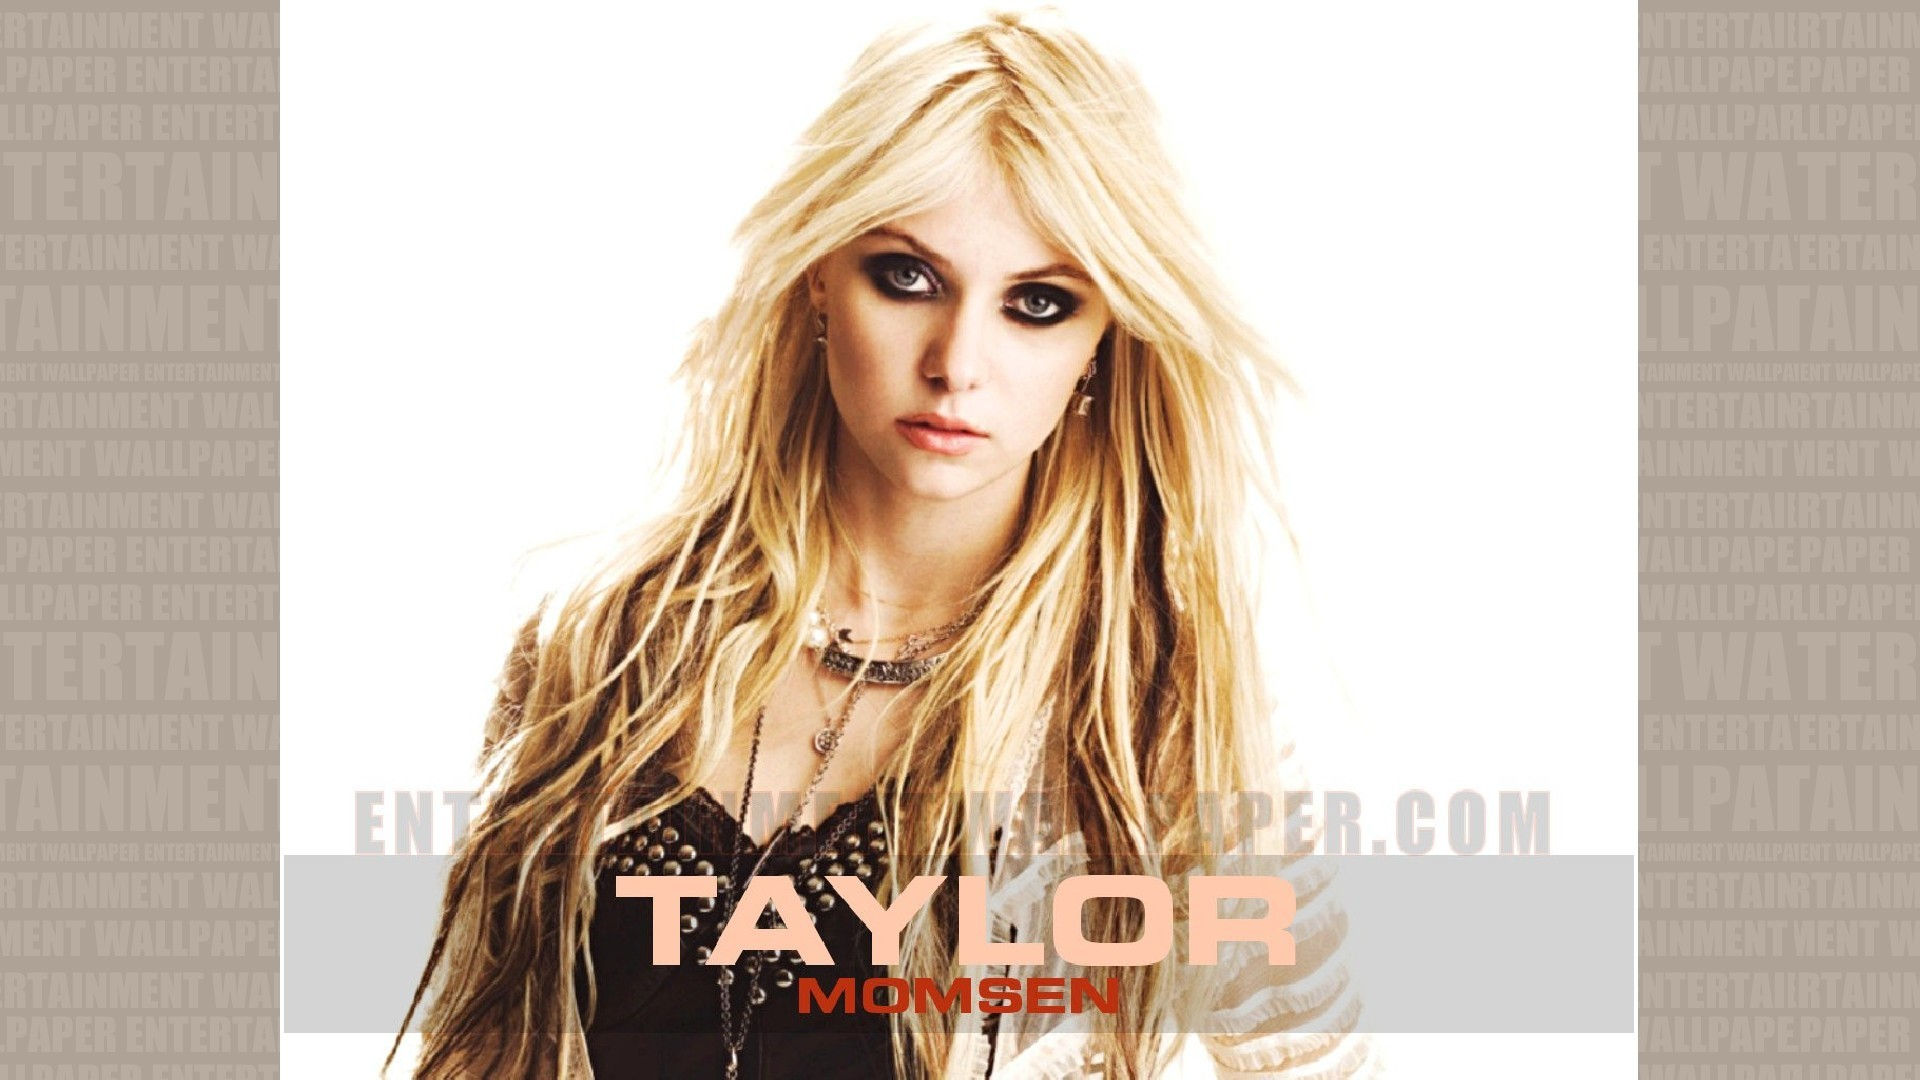 Taylor Momsen Wallpaper – Original size, download now.